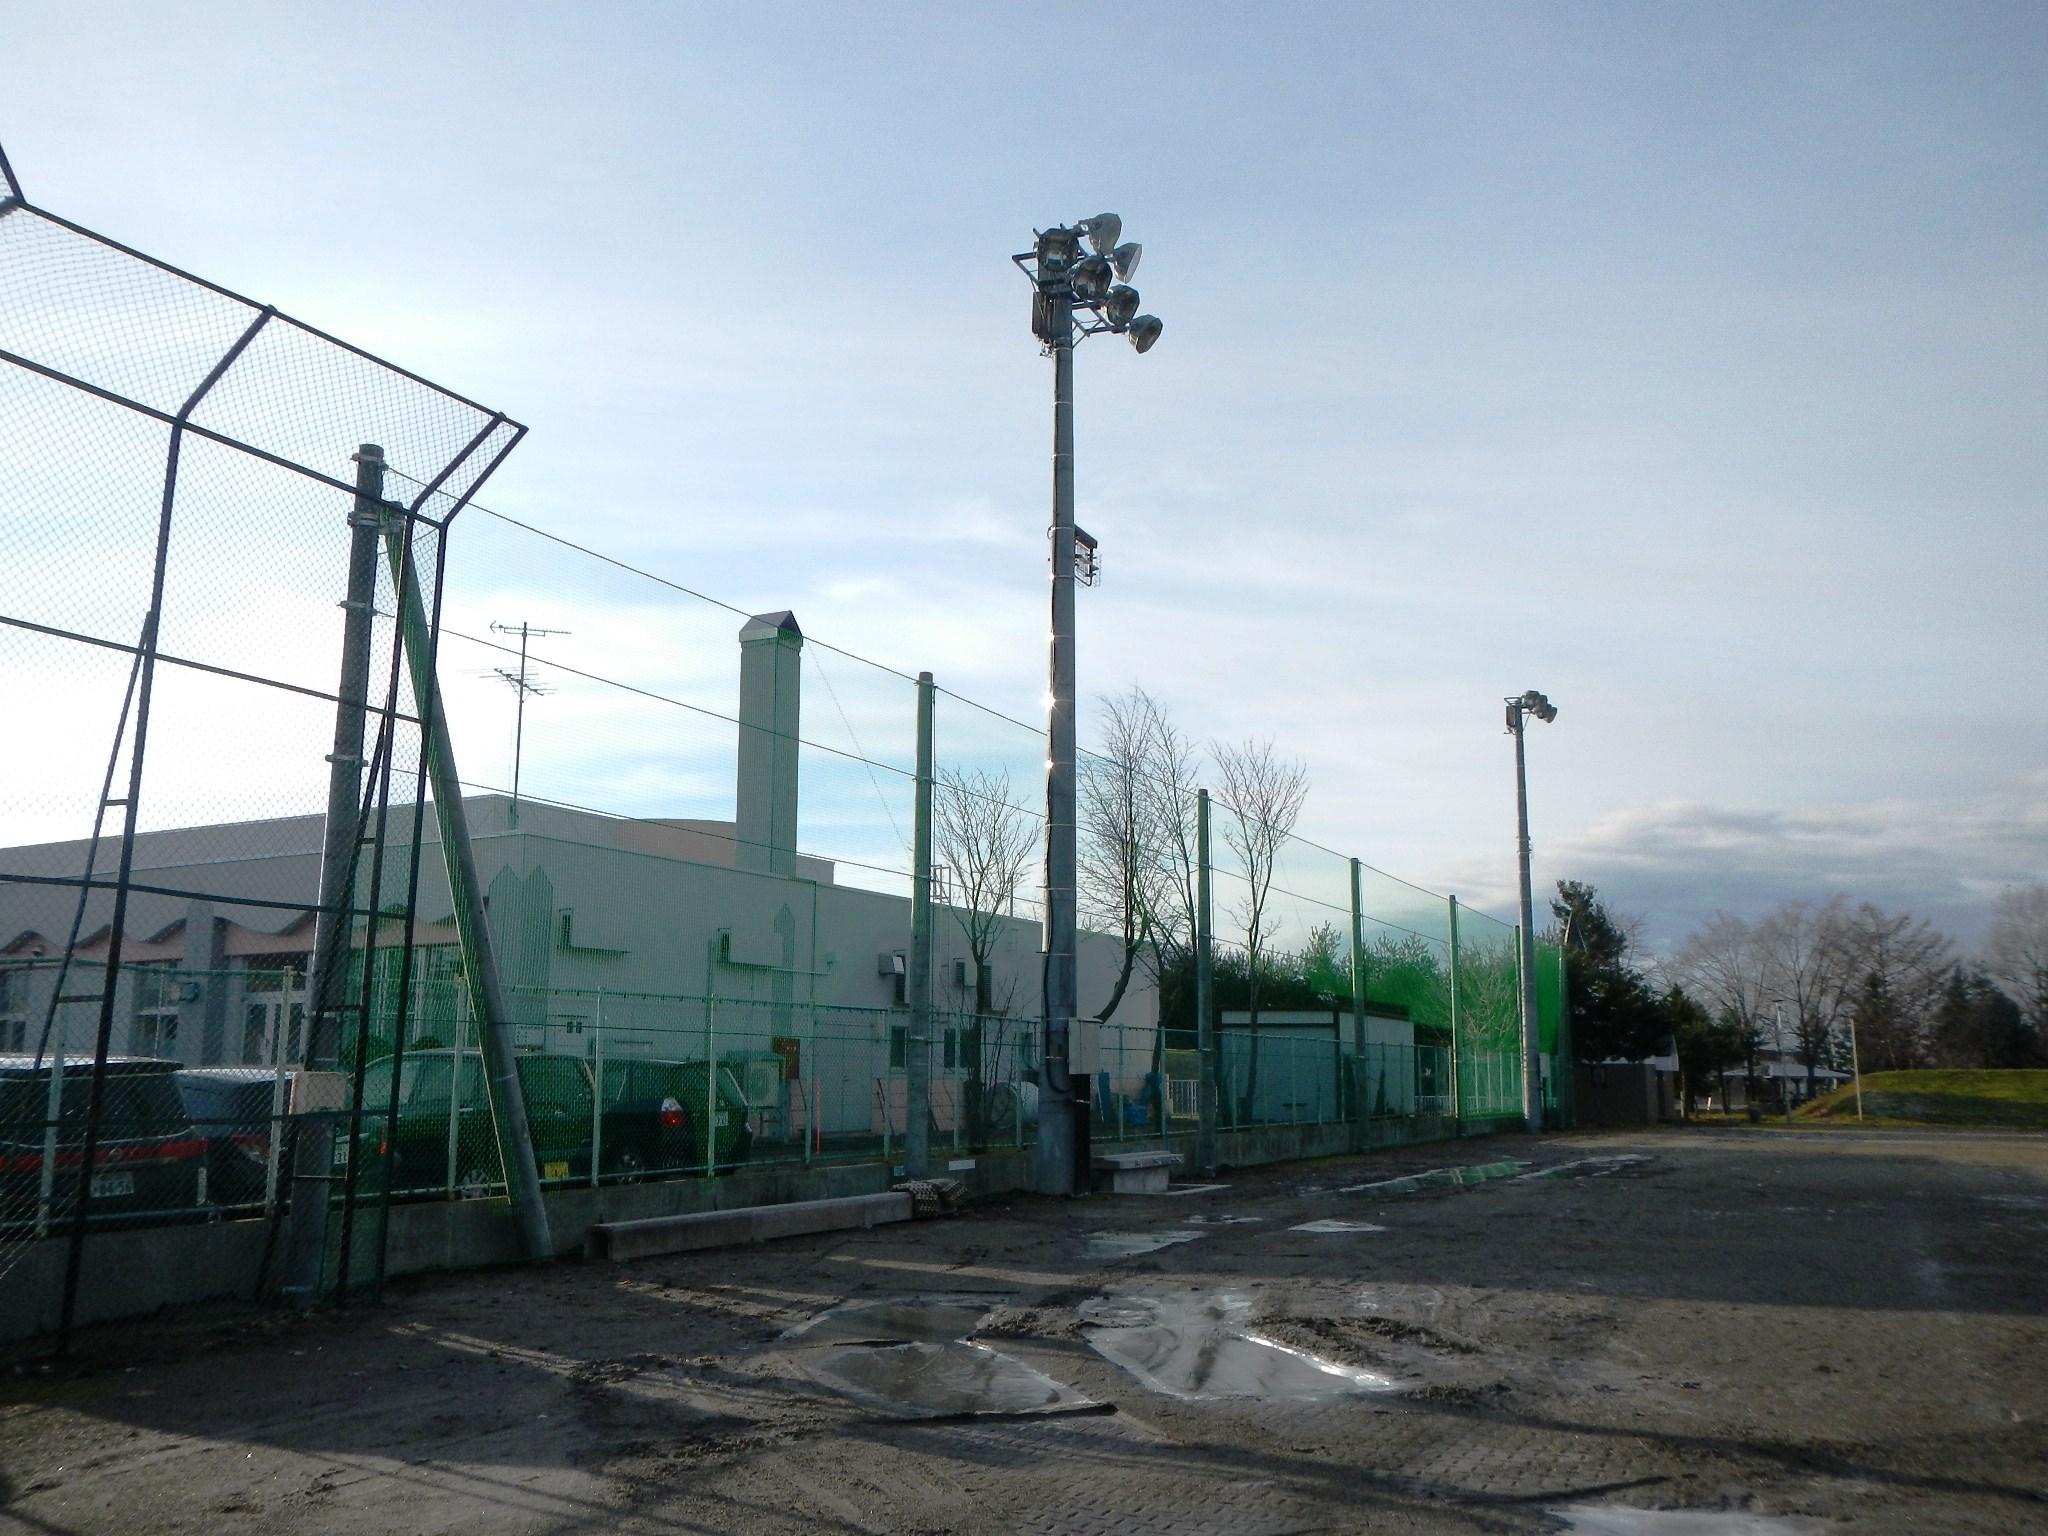 島津球場防球ネット設置工事・設置完了